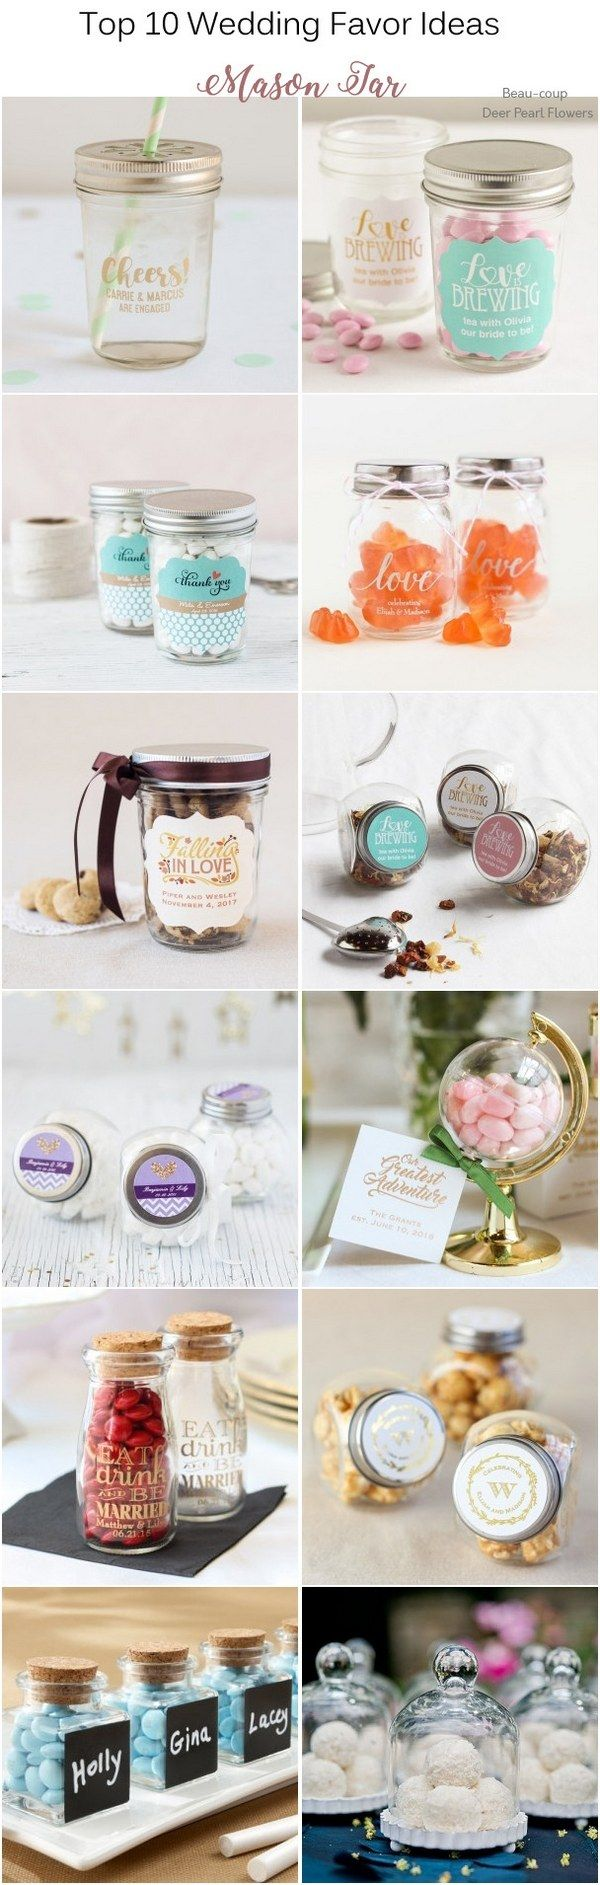 125 best Wedding Gifts images on Pinterest | Best groomsmen gifts ...